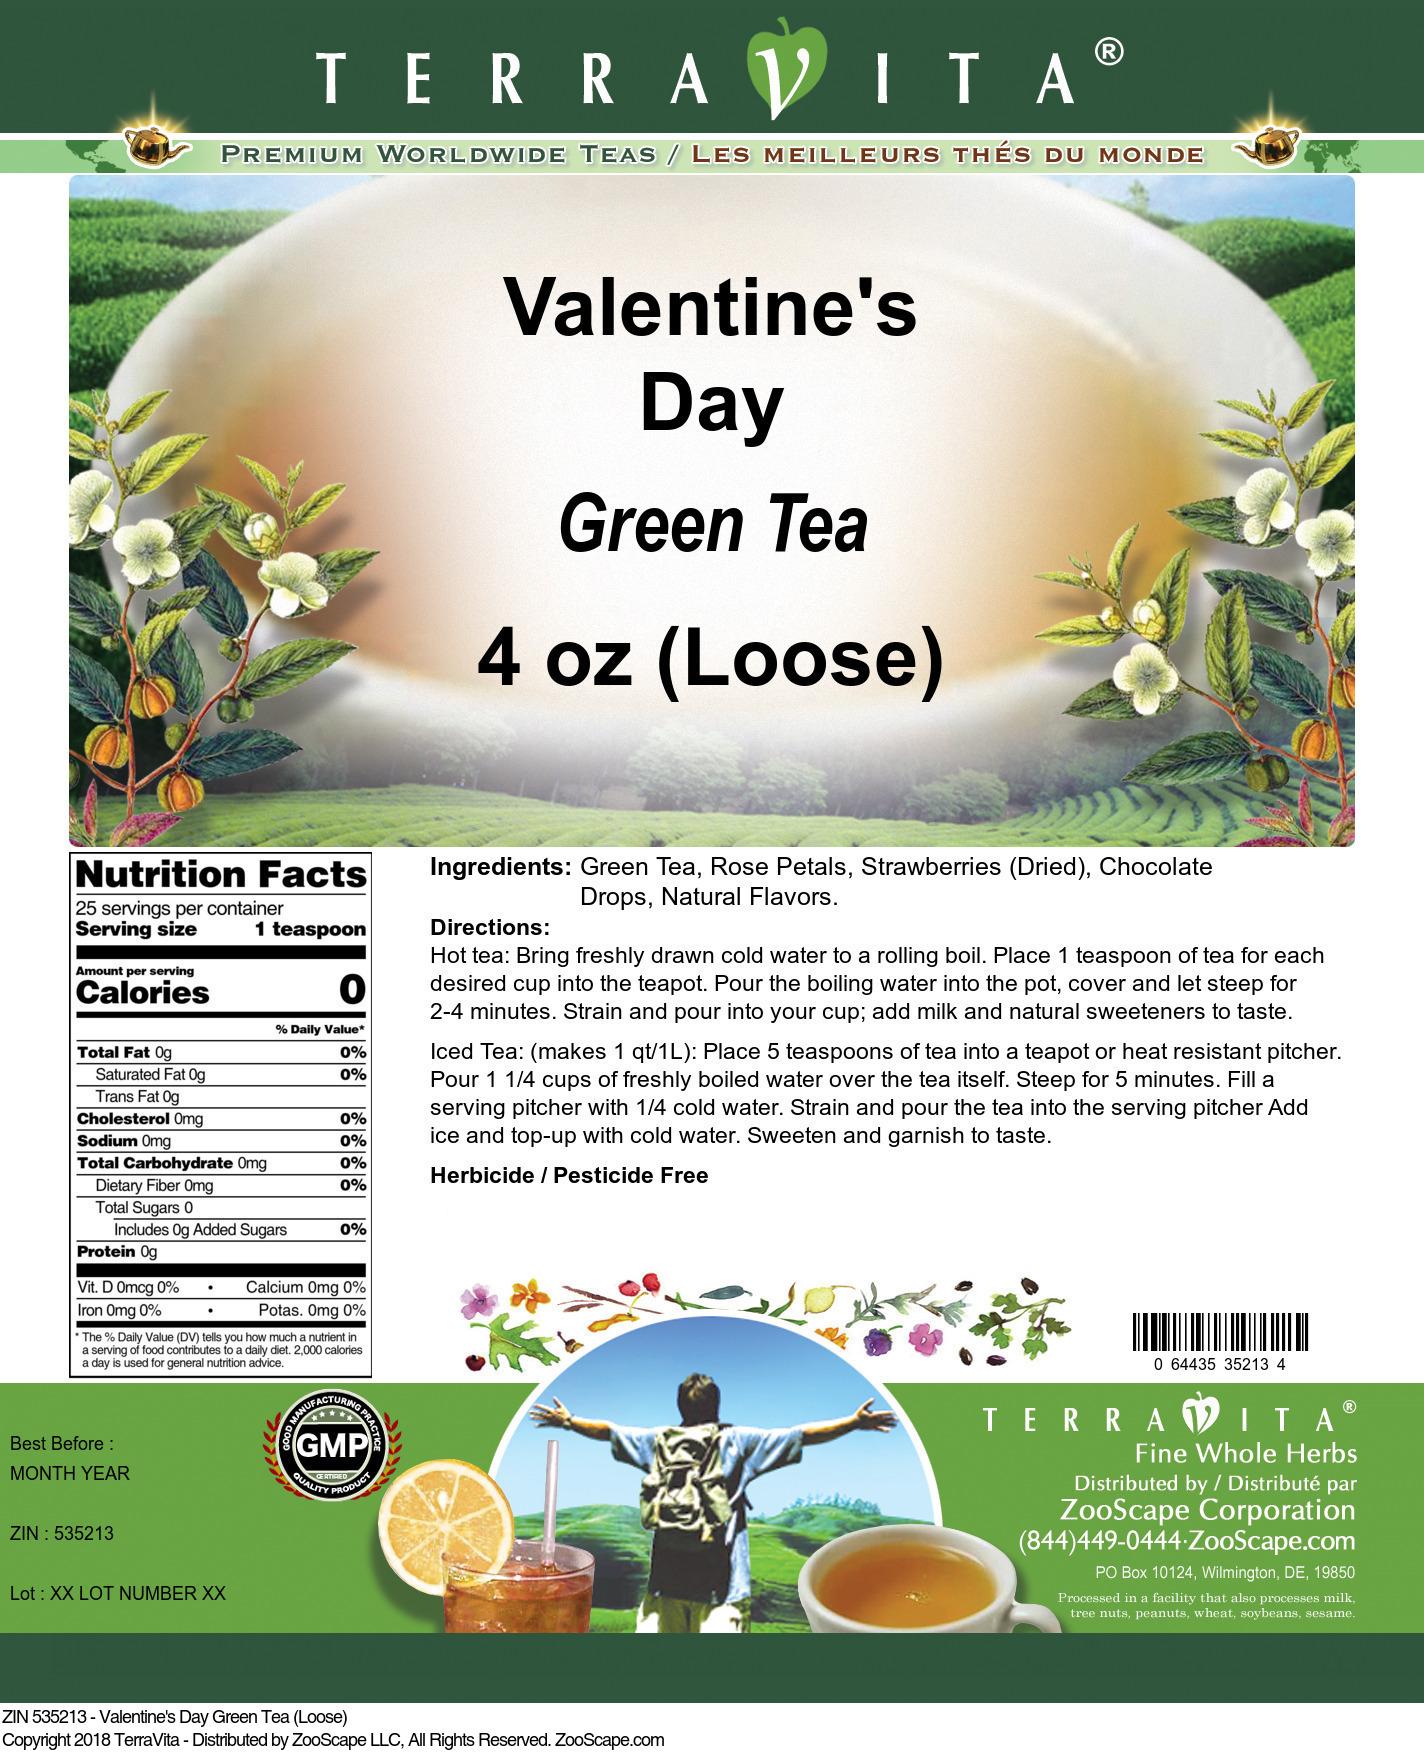 Valentine's Day Green Tea (Loose)